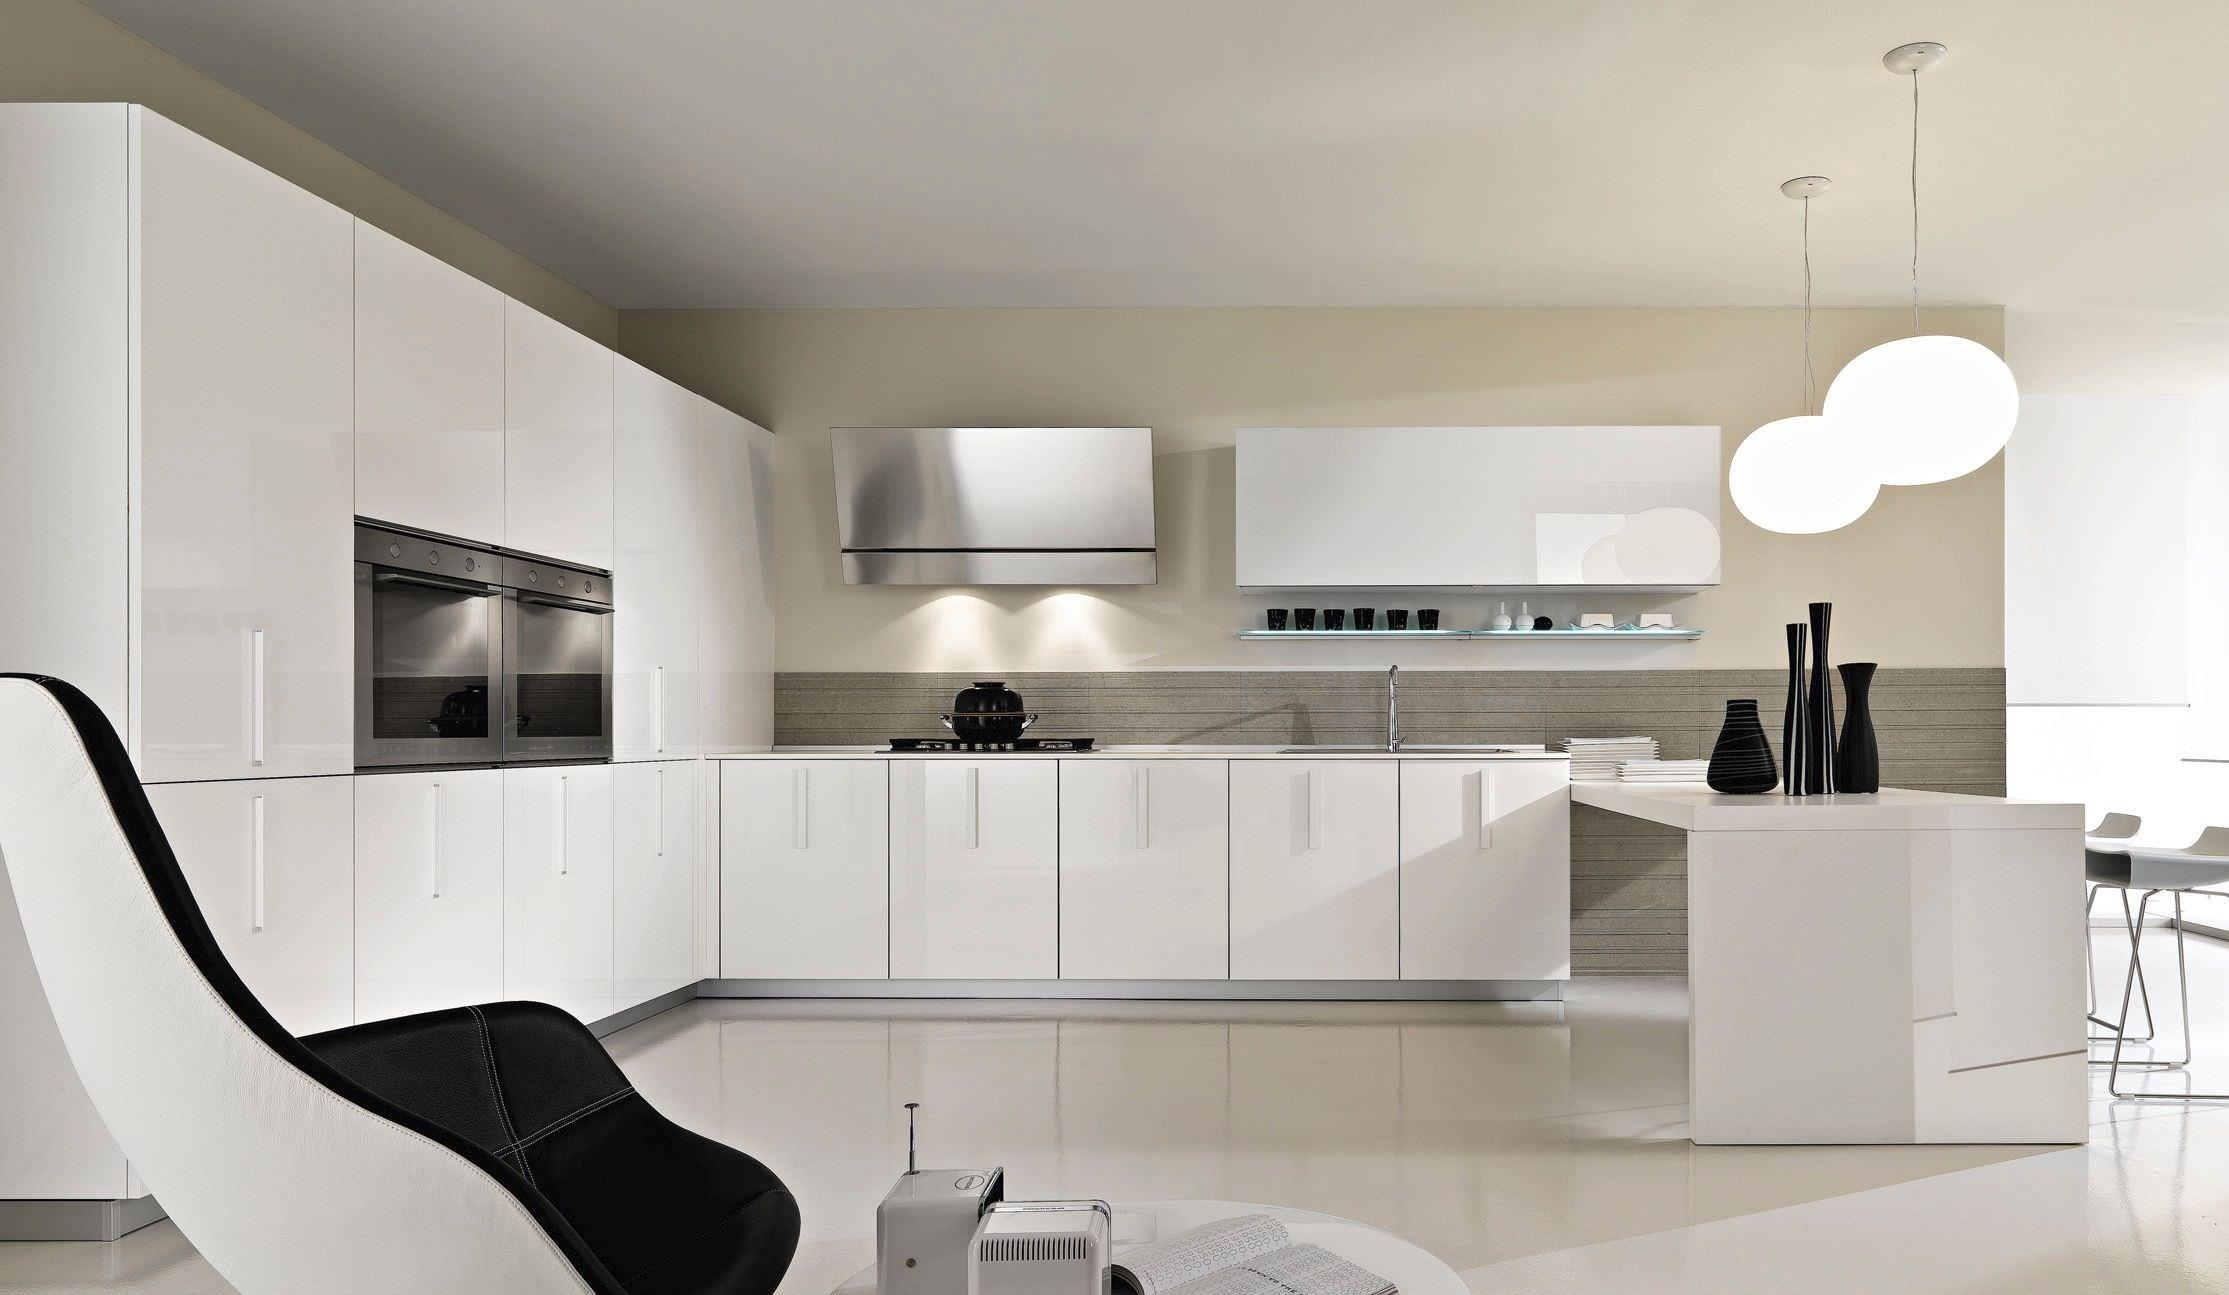 Подсветка кухонного гарнитура белого